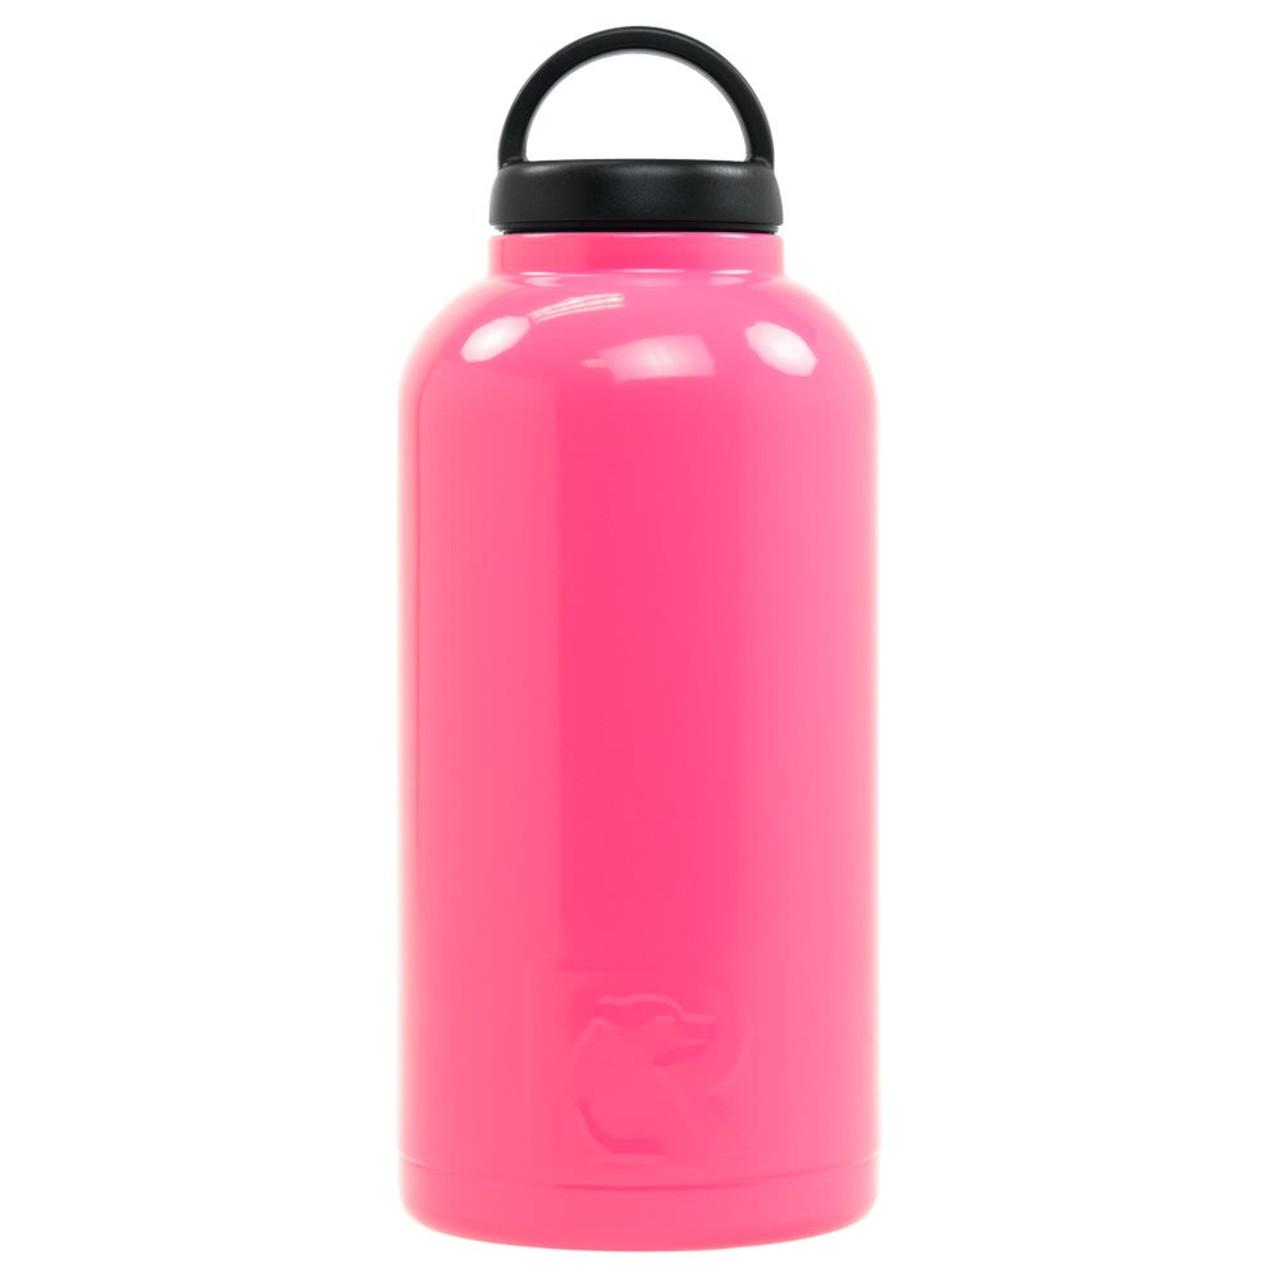 40f2a668838 RTIC 64 oz. Bottle | Perfect Etch